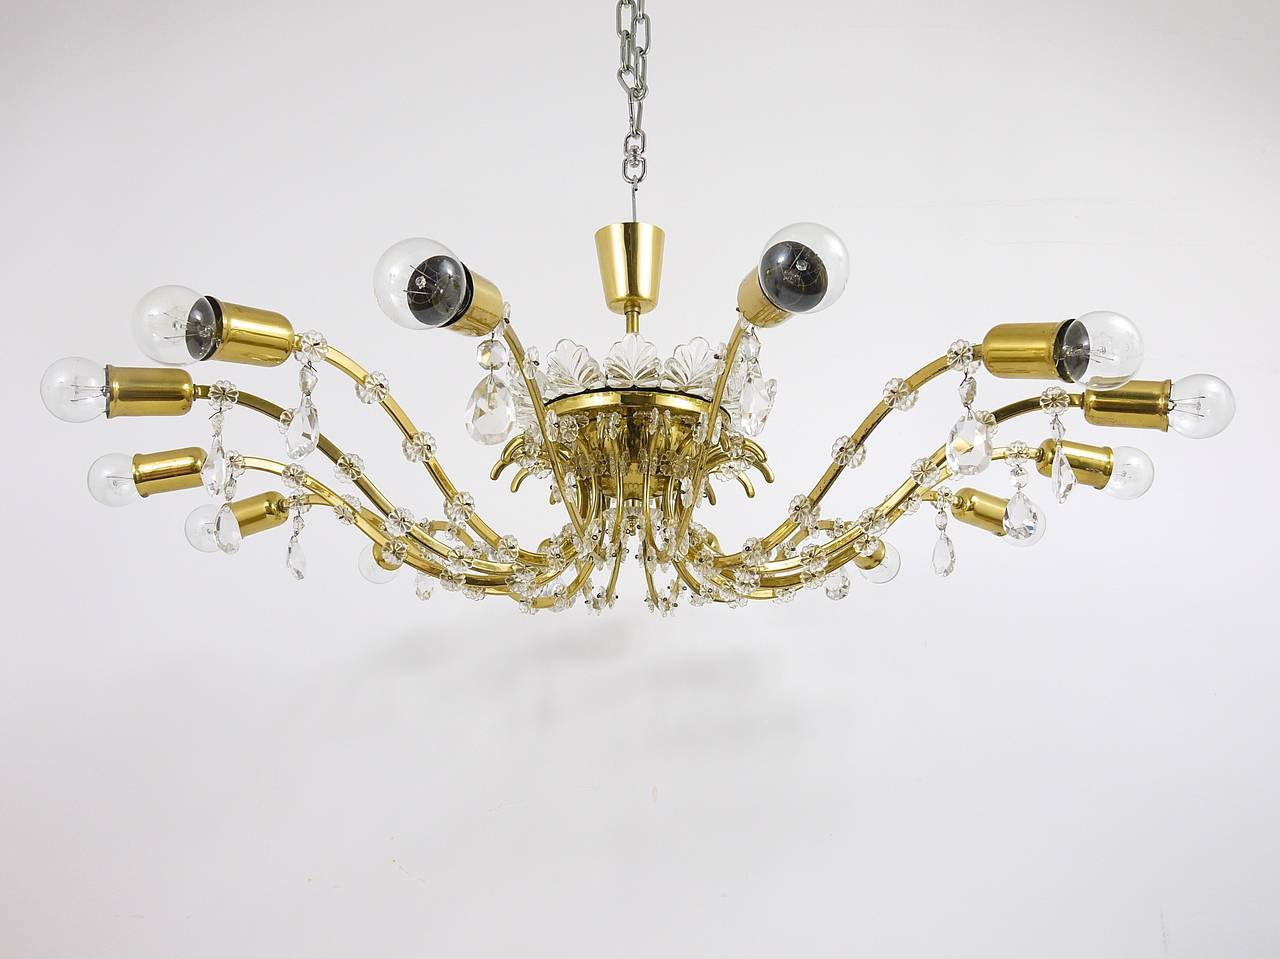 Huge Floral Lobmeyr Mid-Century Brass Crystal Chandelier, 1950s, Austria For Sale 5